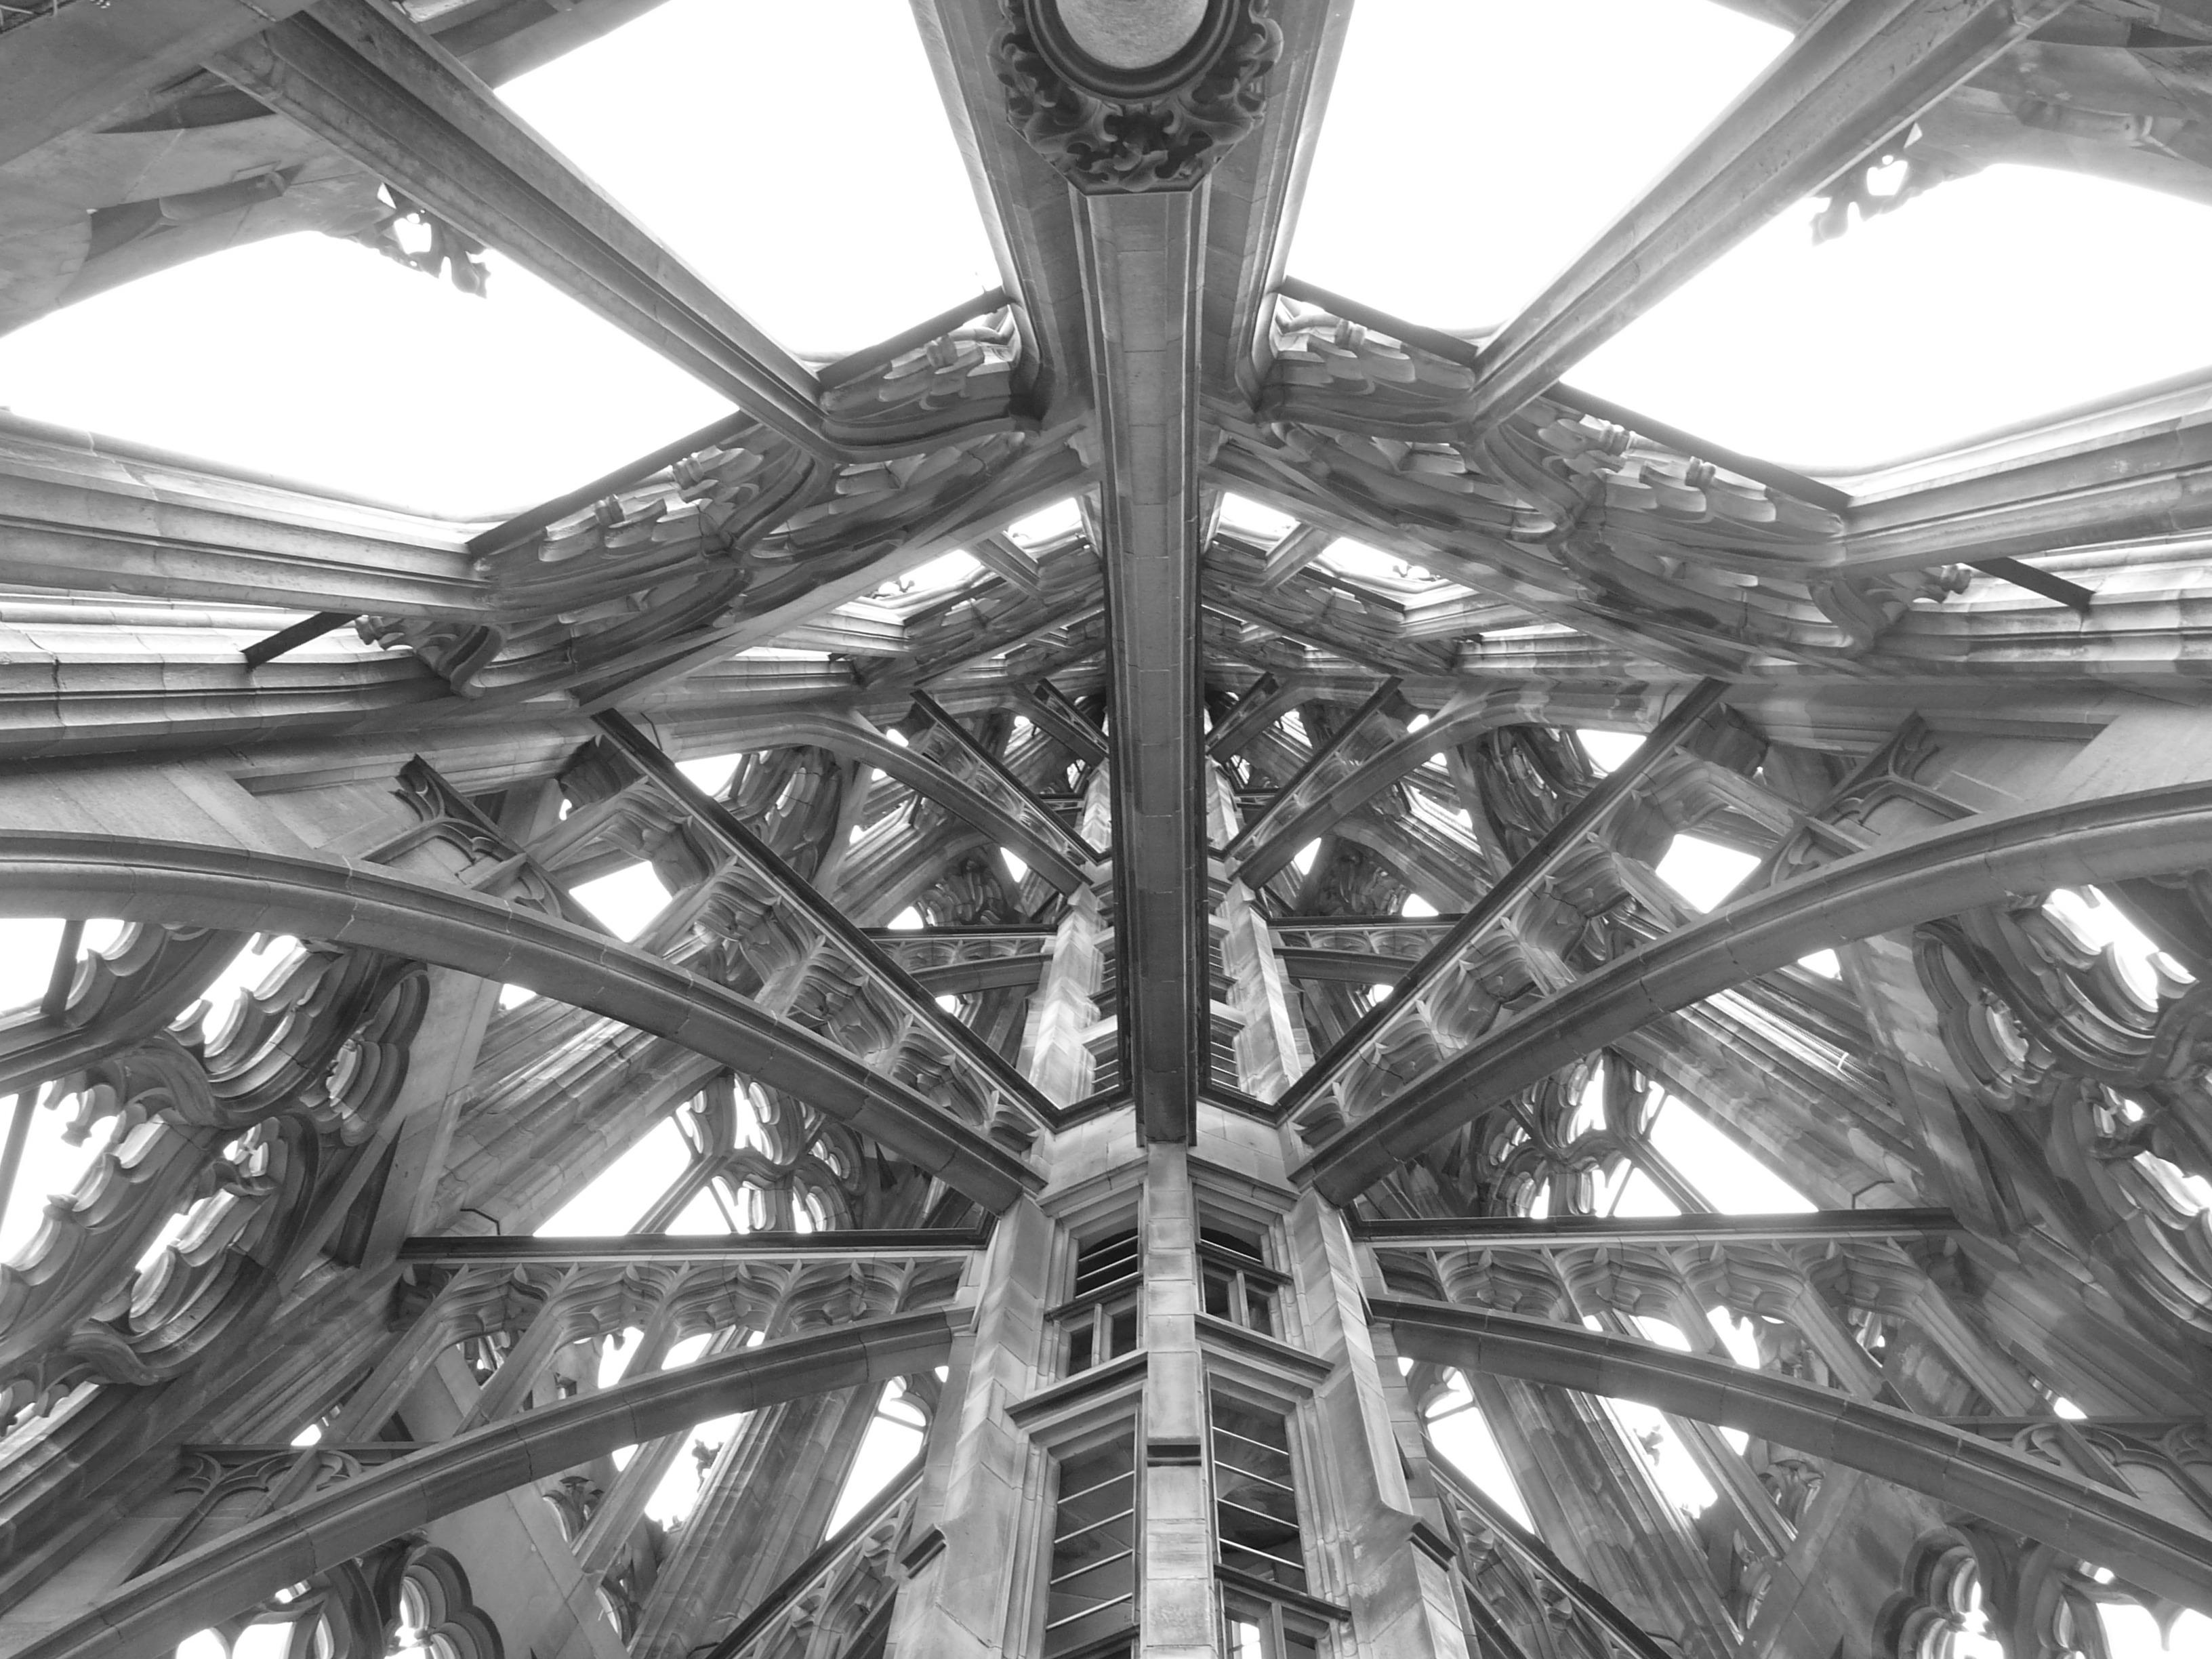 ... building ceiling pillar church lighting gothic art design arches symmetry light fixture dome dom arcades enormous sand stone impressive ... & Free Images : black and white architecture structure wheel ... azcodes.com